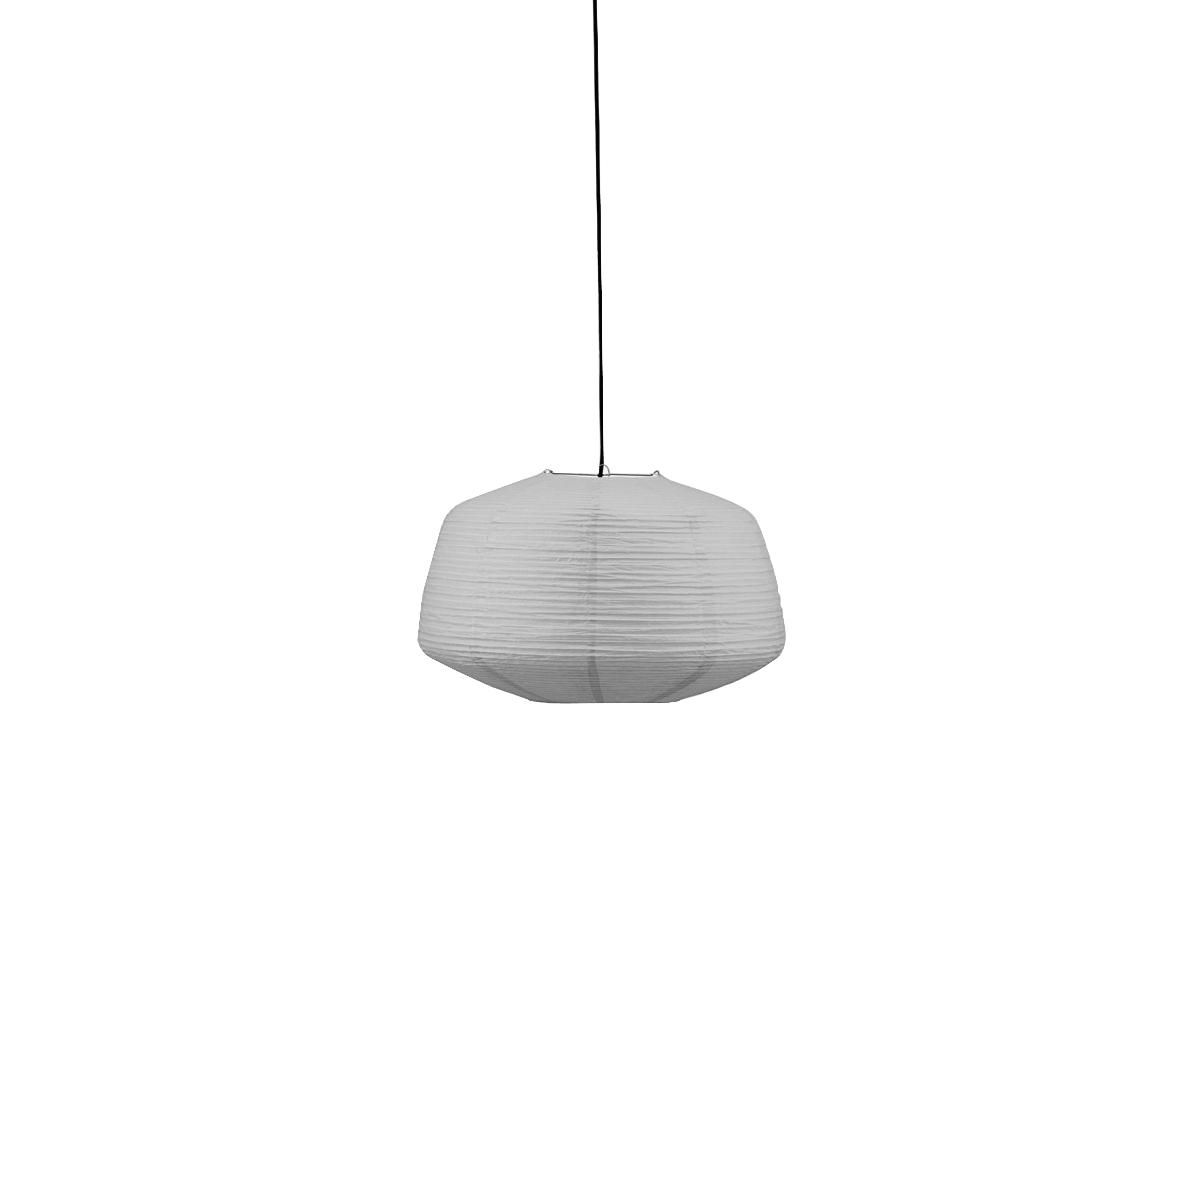 House Doctor - Bidar Lamp Shade Ø 50 cm - Grey (259370111)